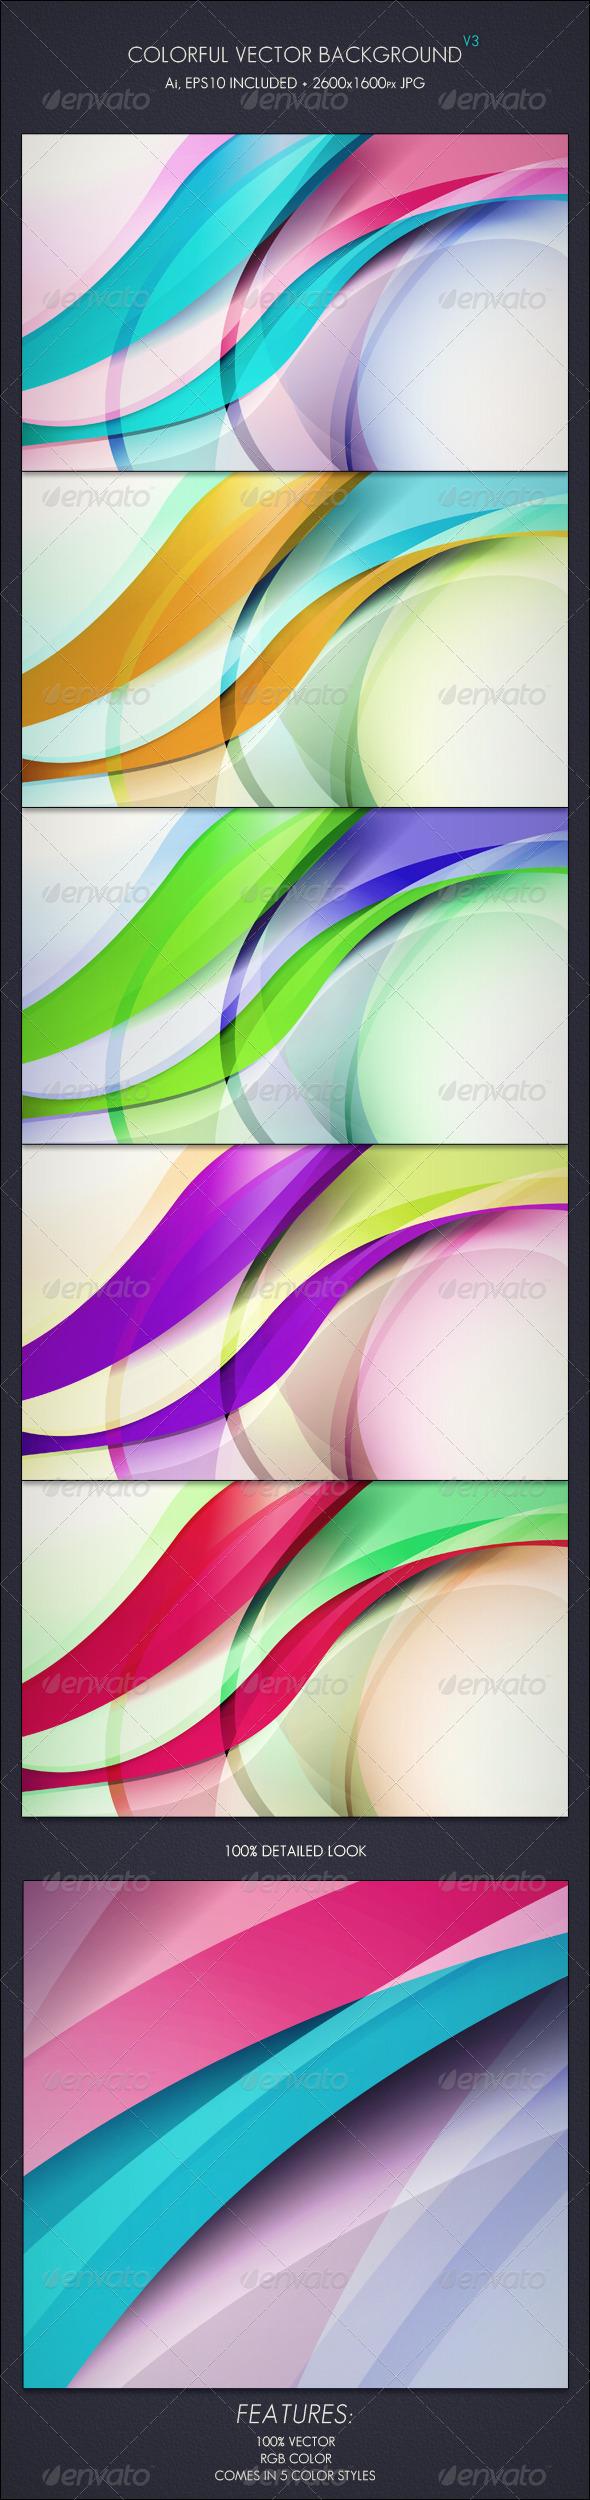 Colorful Vector Background V3 - Backgrounds Decorative